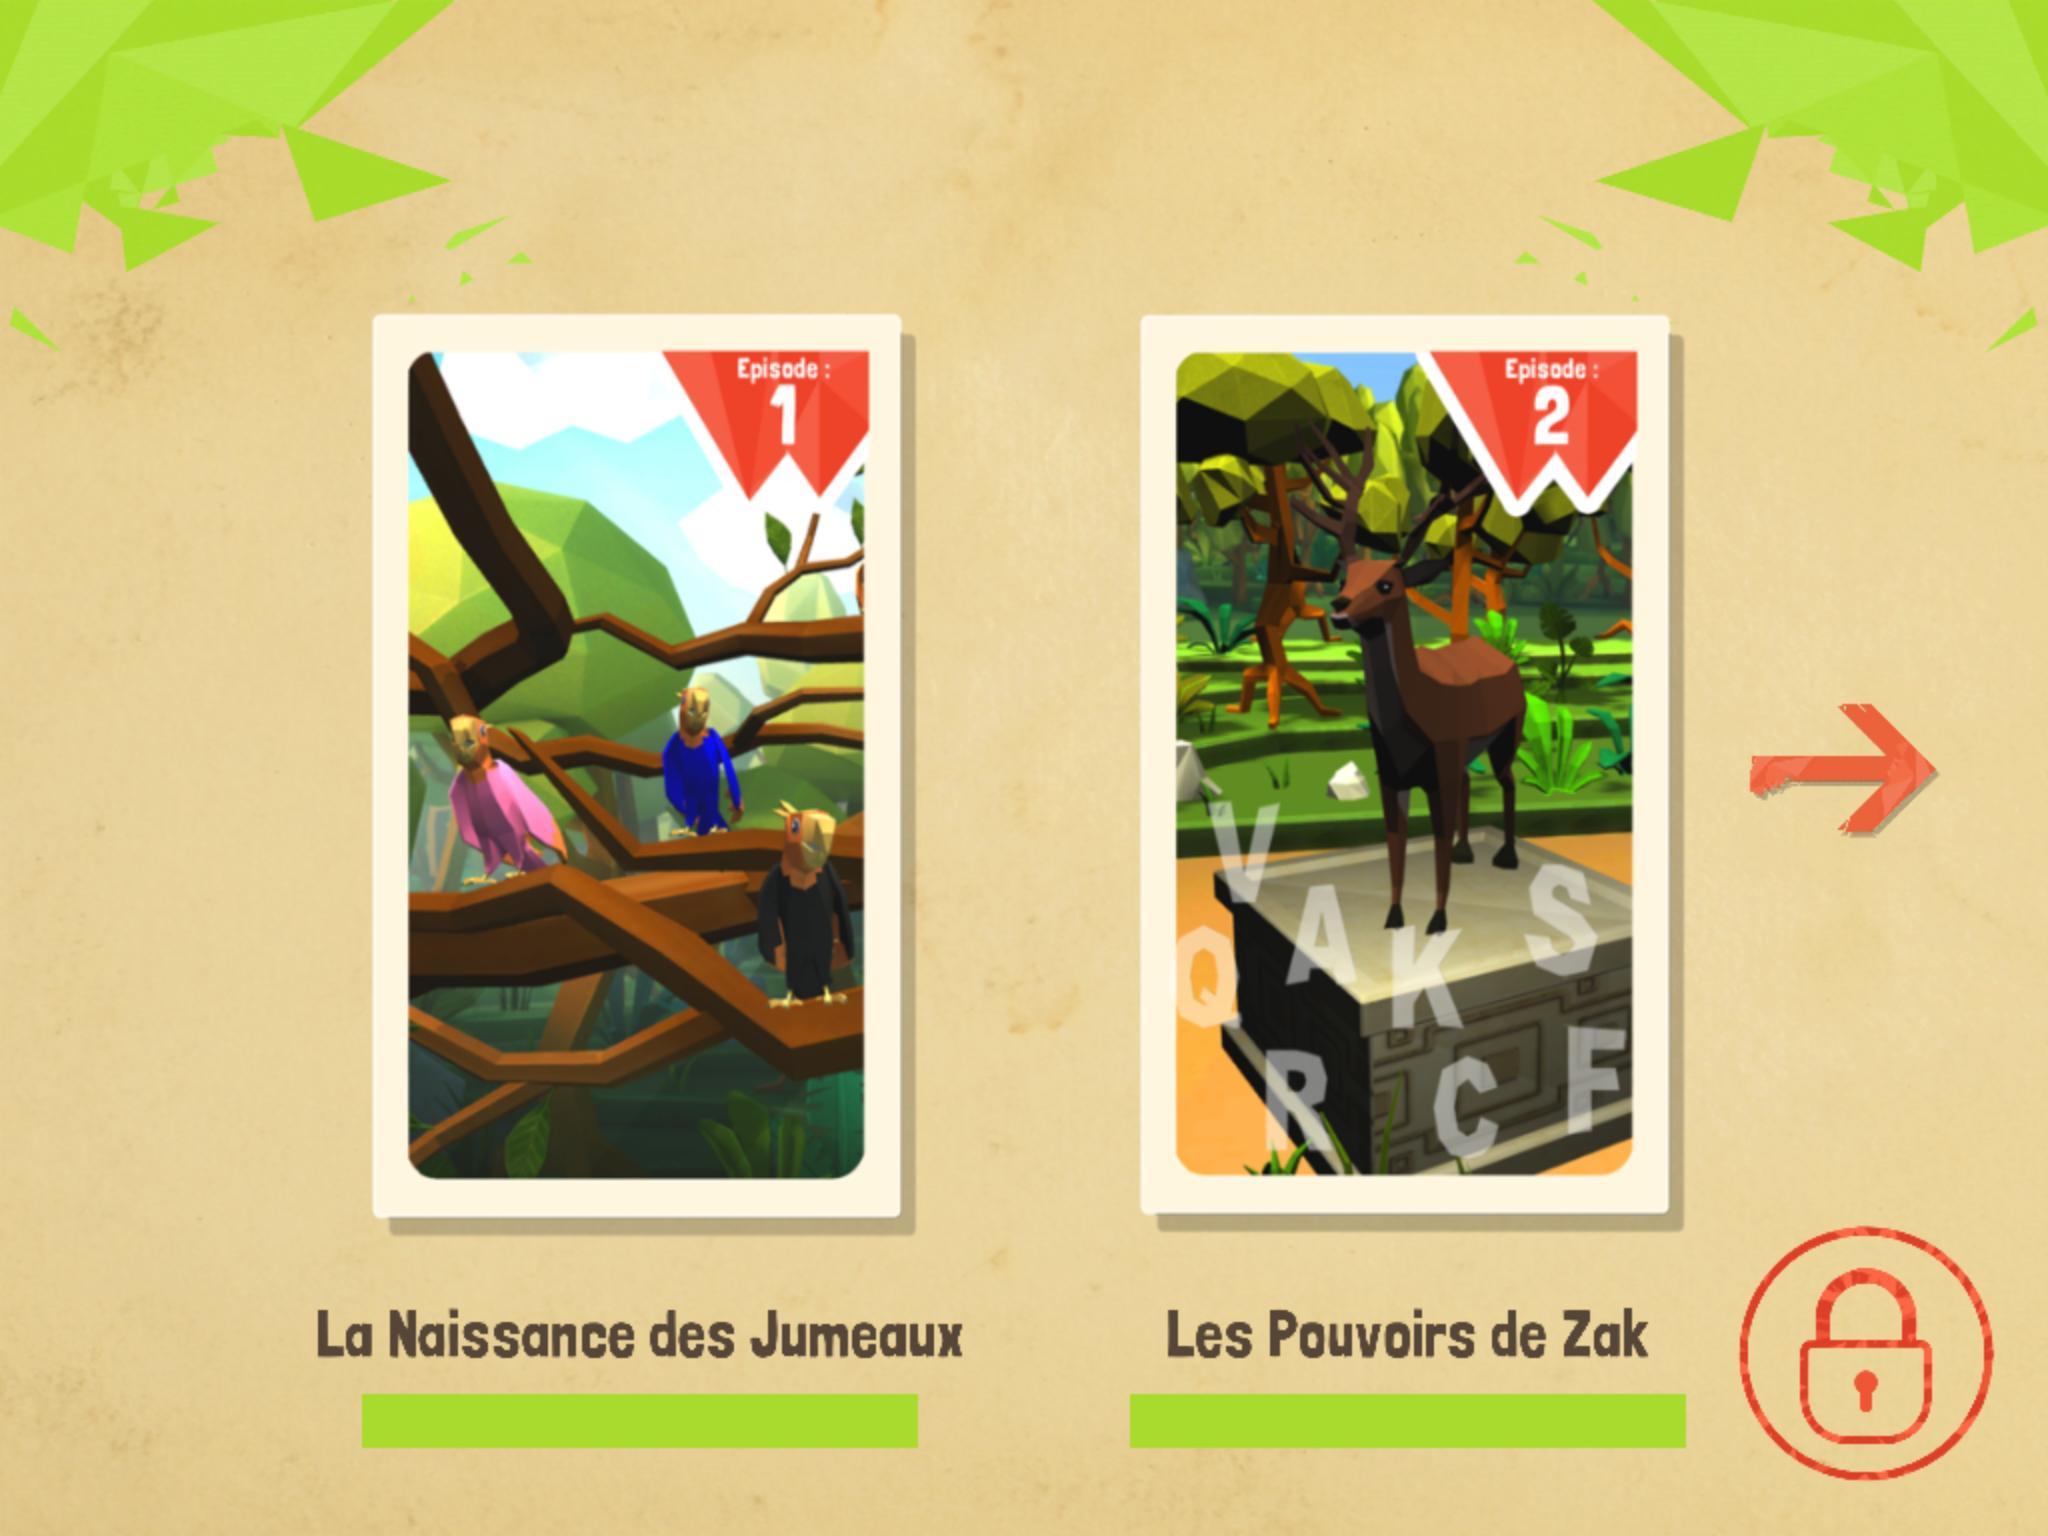 Jeu Maternelle Gratuit : Pokolpok For Android - Apk Download à Jeux Maternelle Gratuit